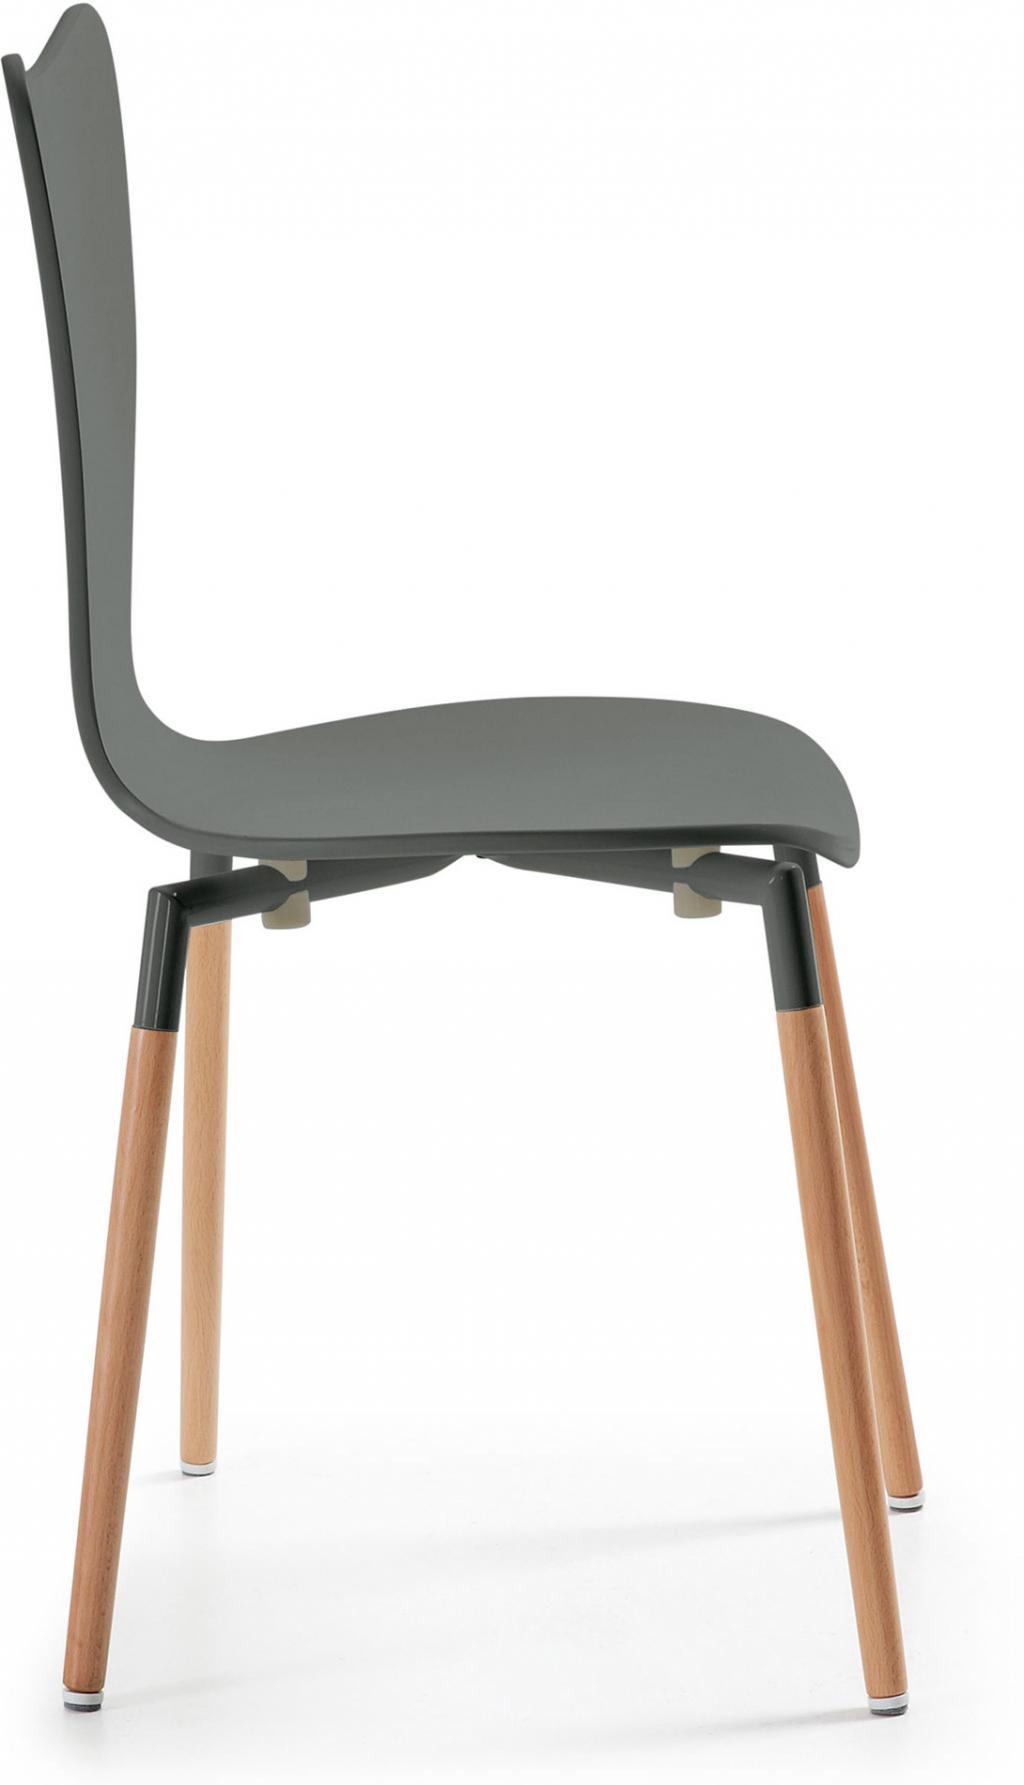 stuhl wing grau holz la forma kaufen wohn und lifestylewebshop. Black Bedroom Furniture Sets. Home Design Ideas